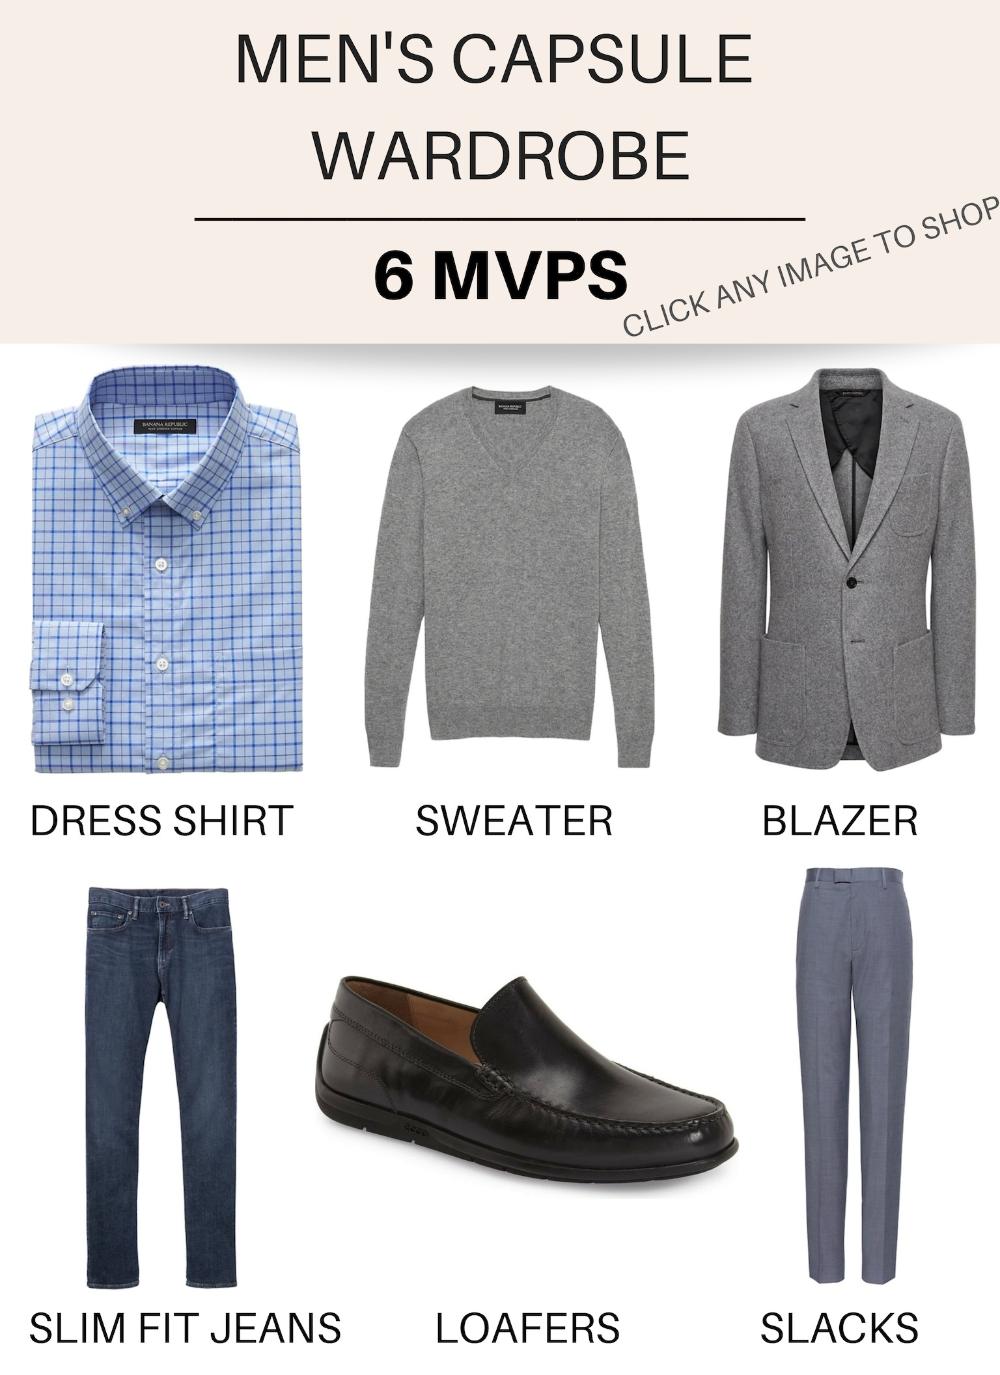 Capsule Wardrobe for Men: The Best Secret in Mens Style